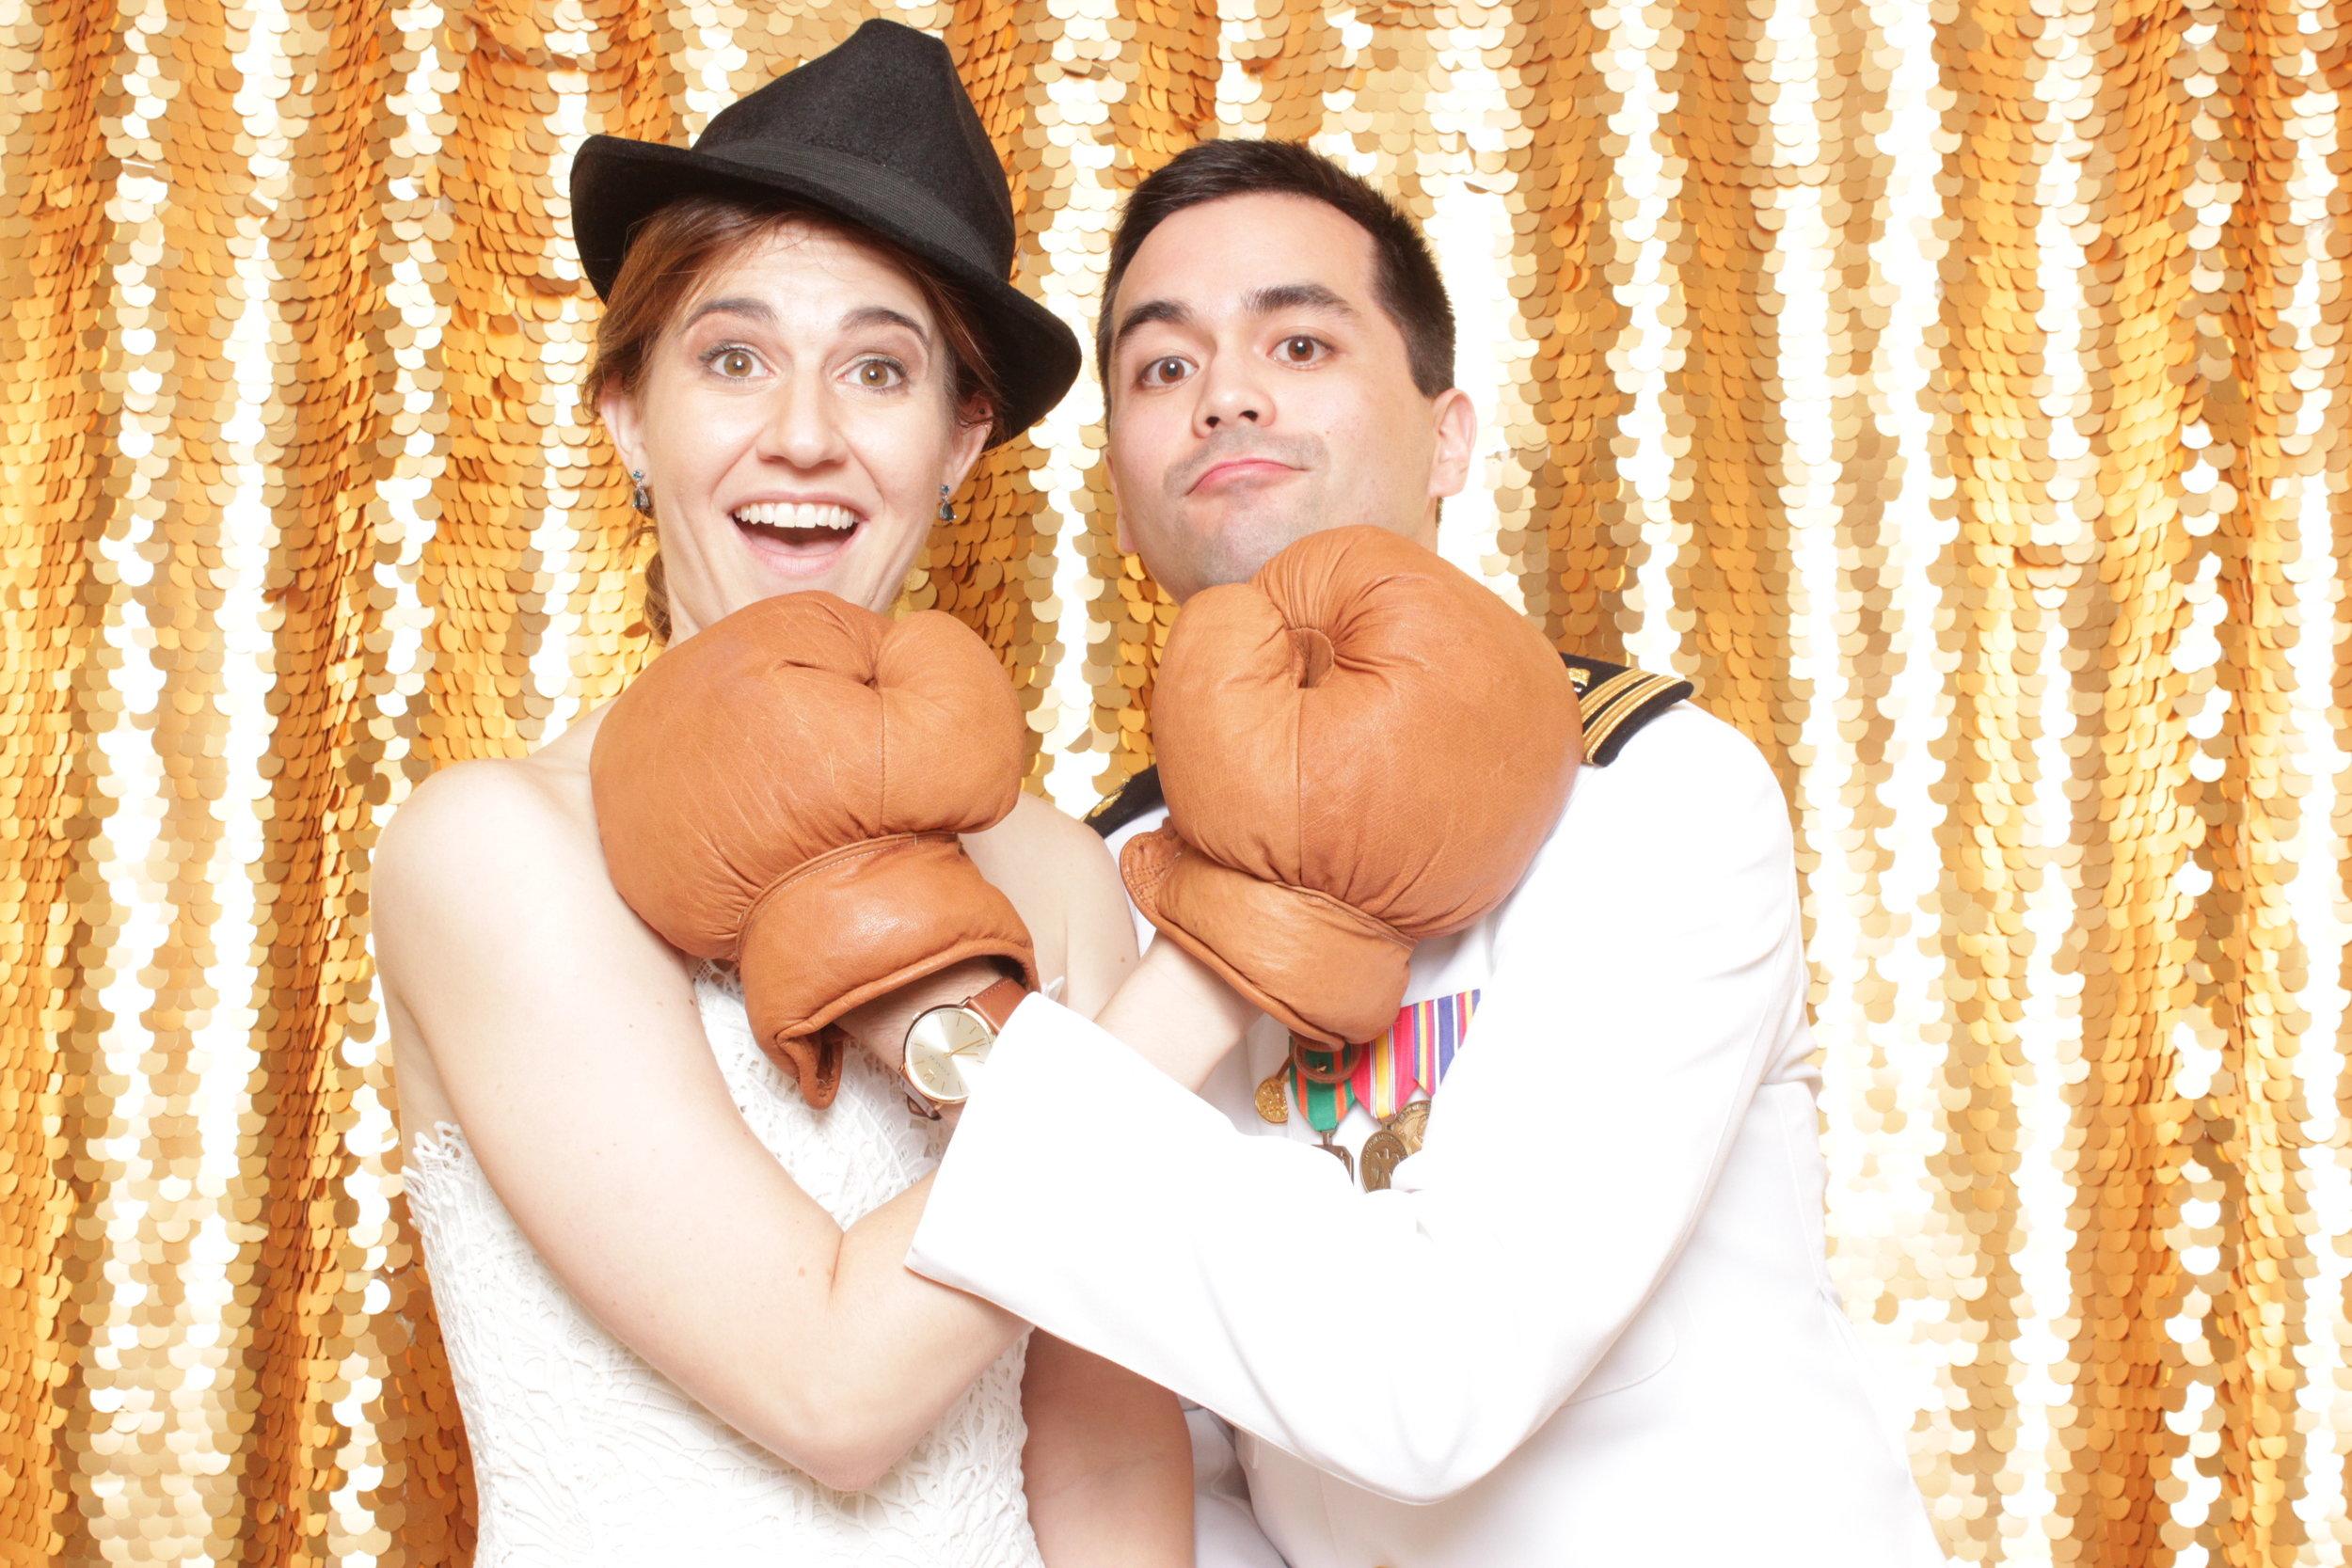 TOM + KRISTYN WEDDING | HOT PINK PHOTO BOOTH